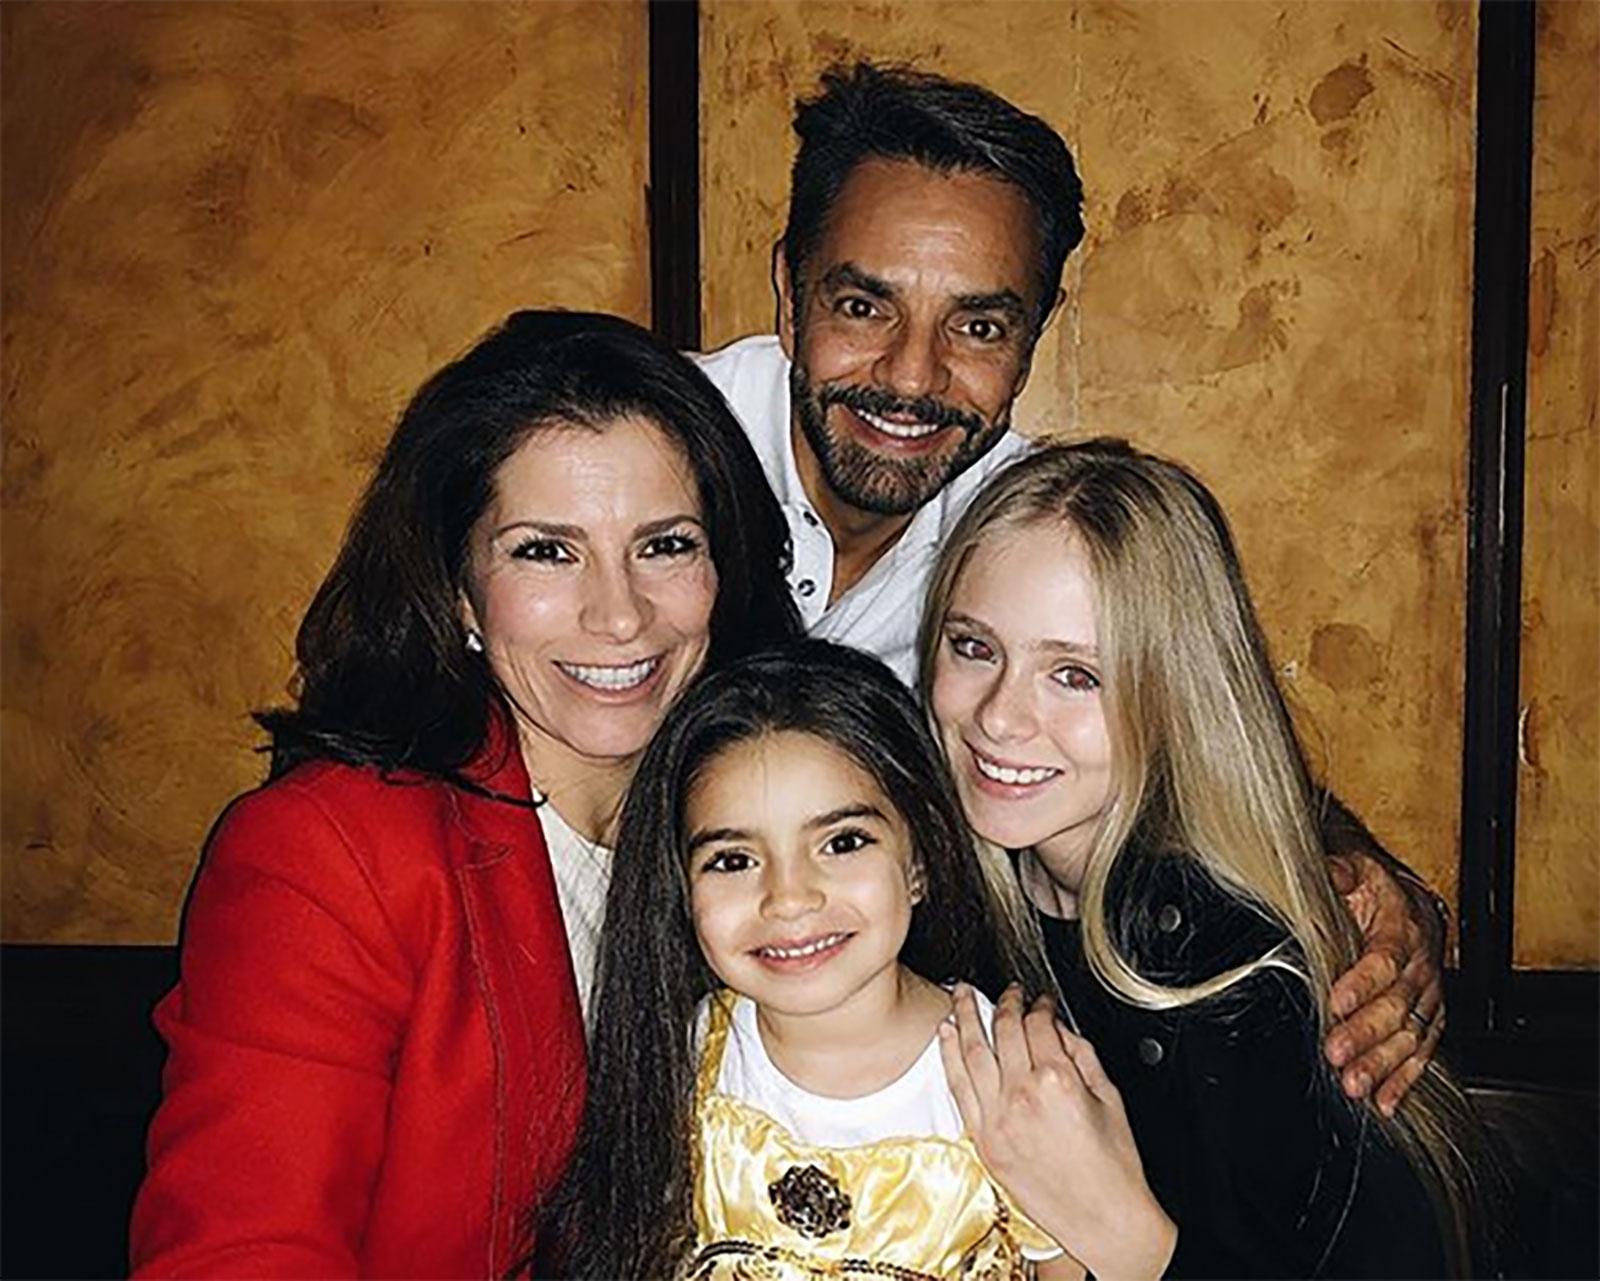 Eugenio Derbez, Loreto Peralta, Alessandra Rosaldo, Aitana Derbez